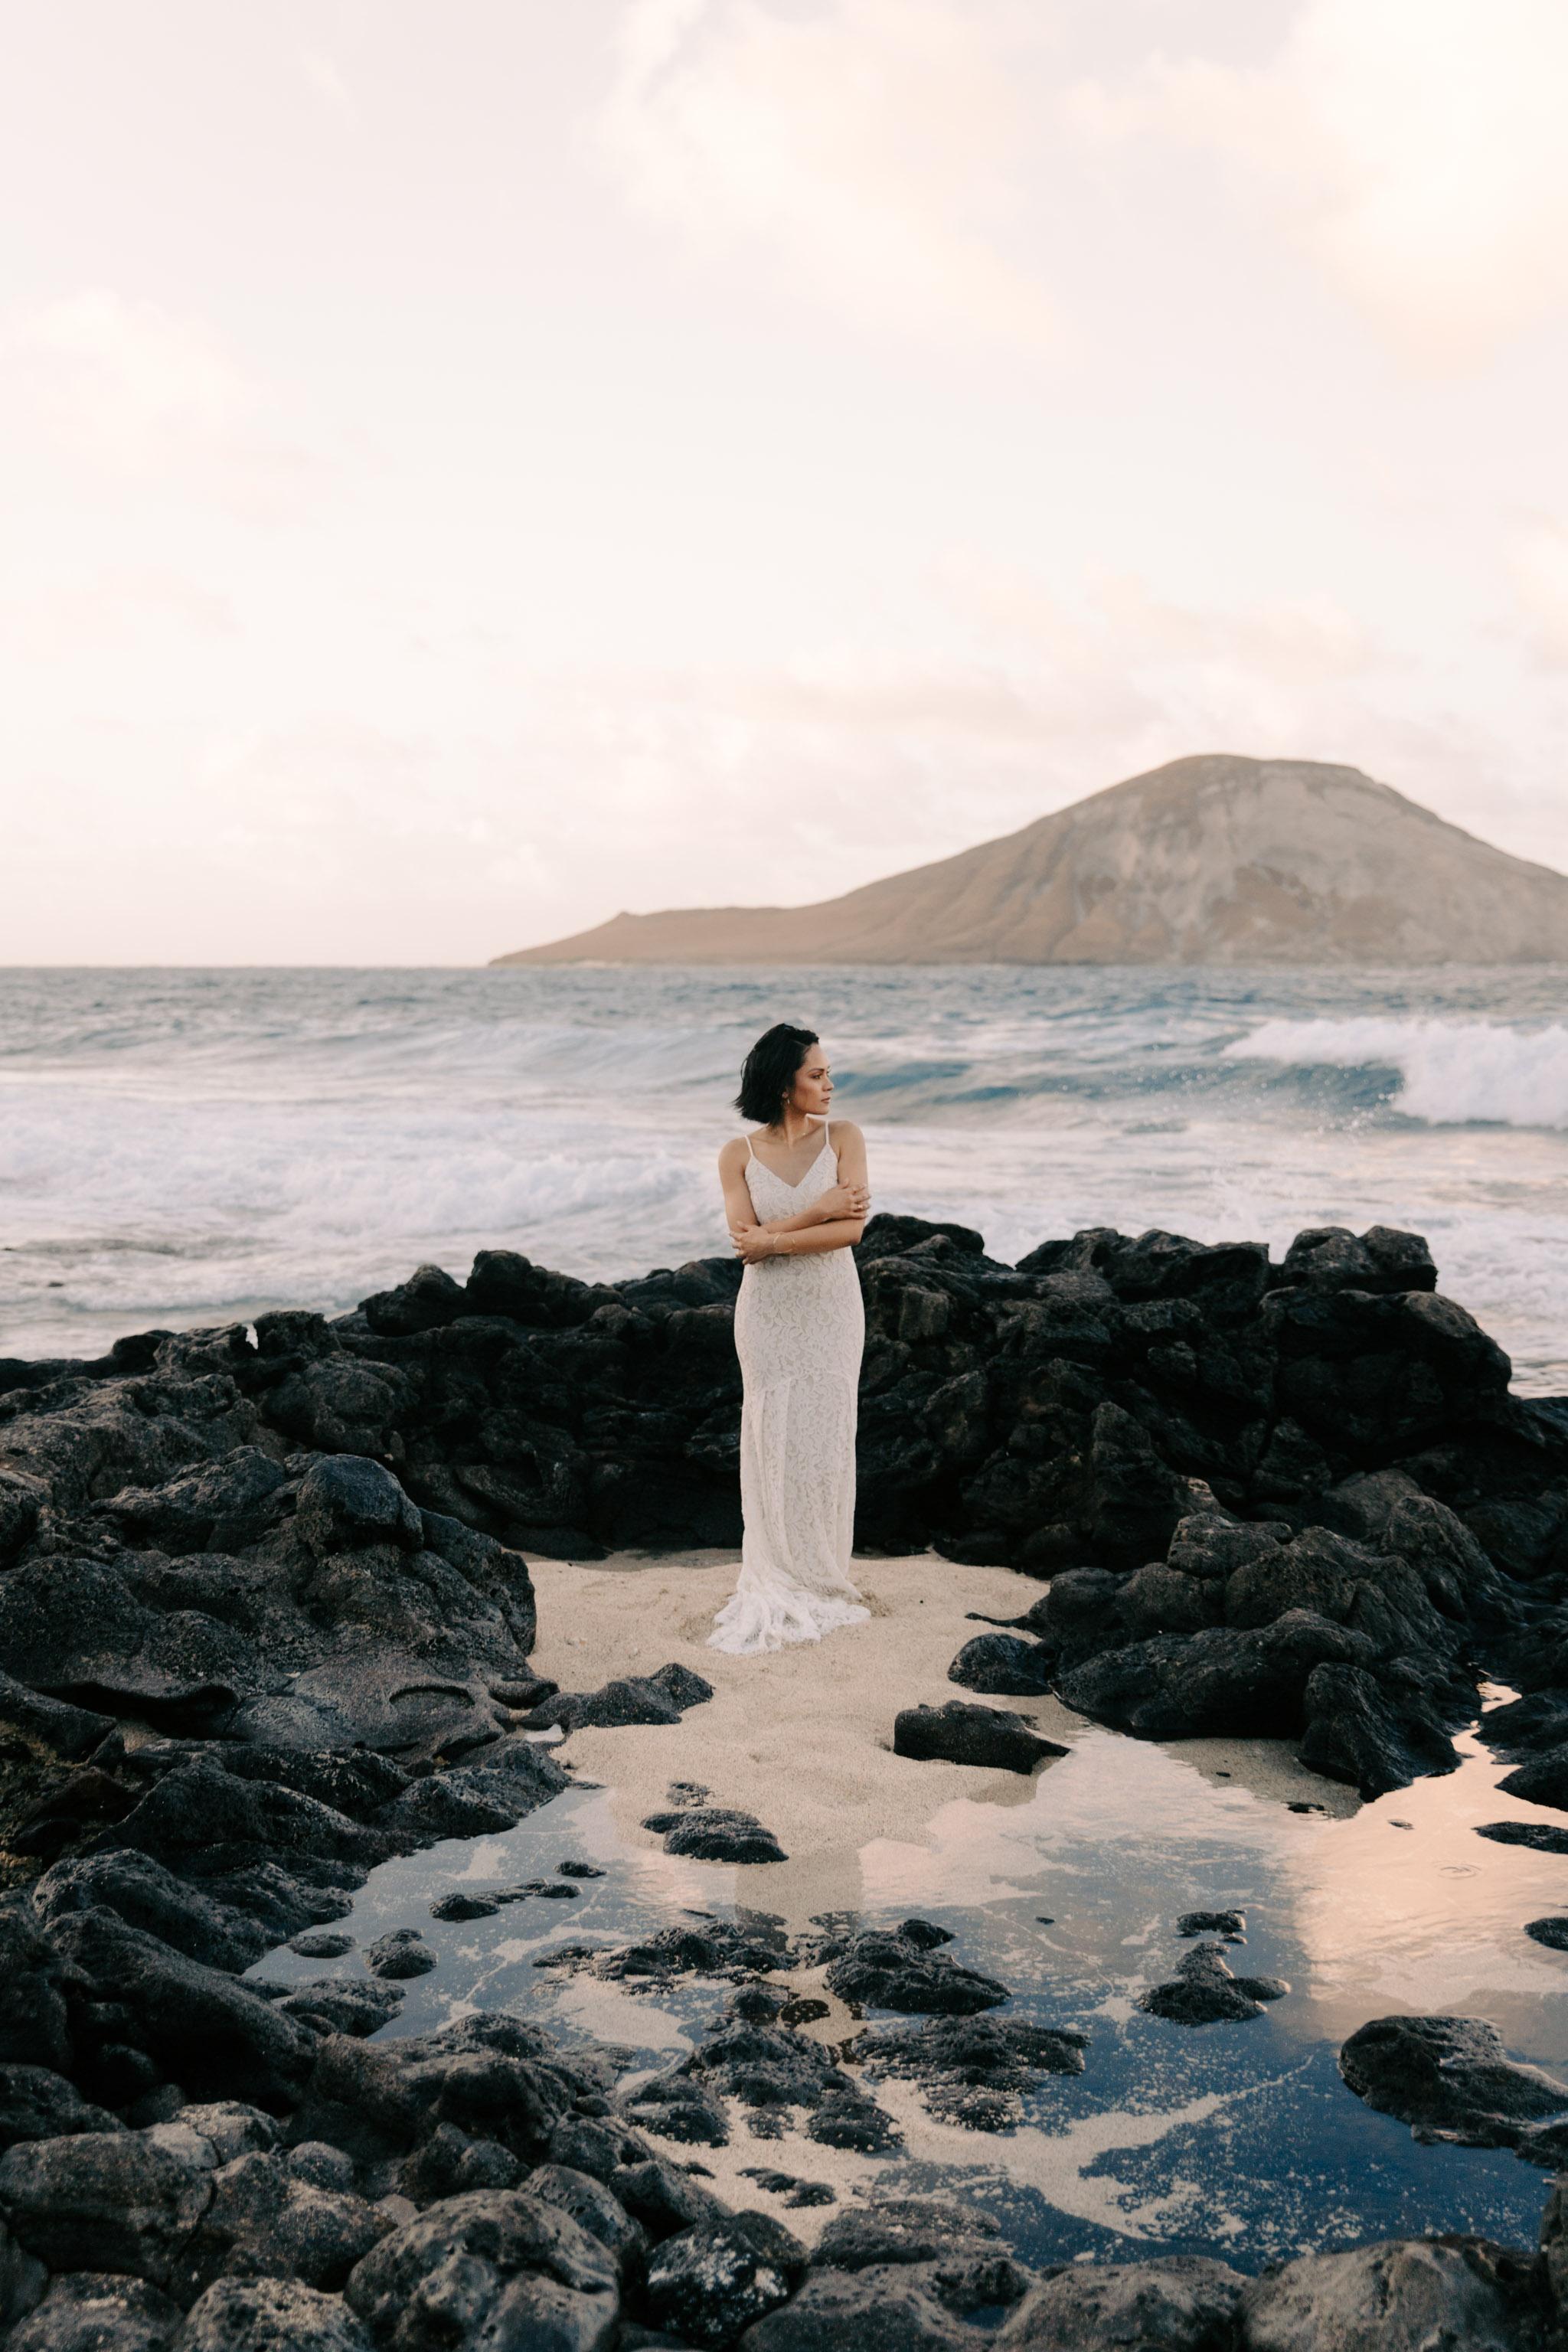 makapuu tidepool bridal portraits by hawaii wedding photographer Desiree Leilani